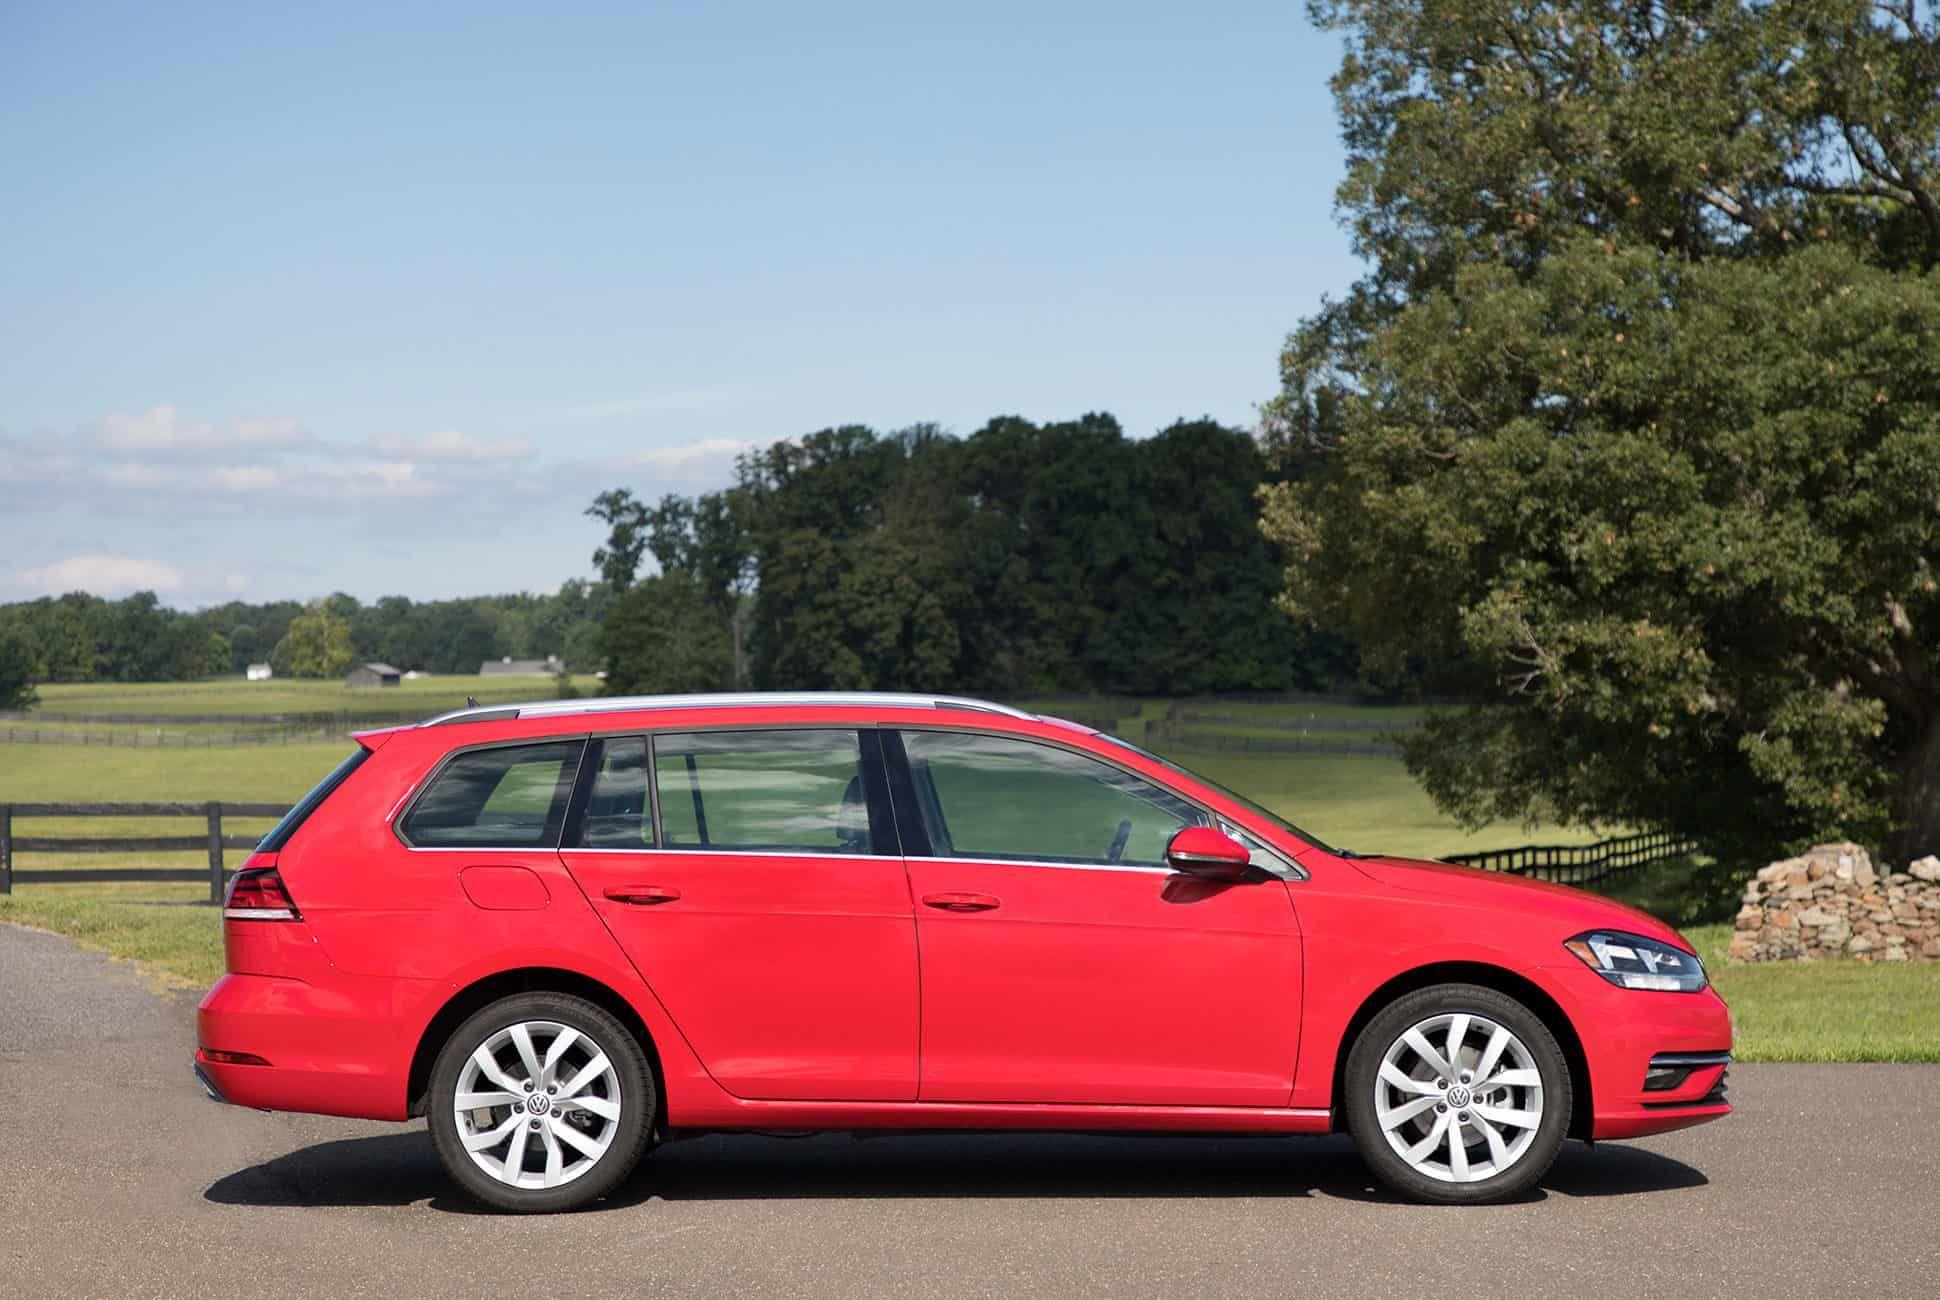 Volkswagen-Sportwagen-Review-gear-patrol-slide-3